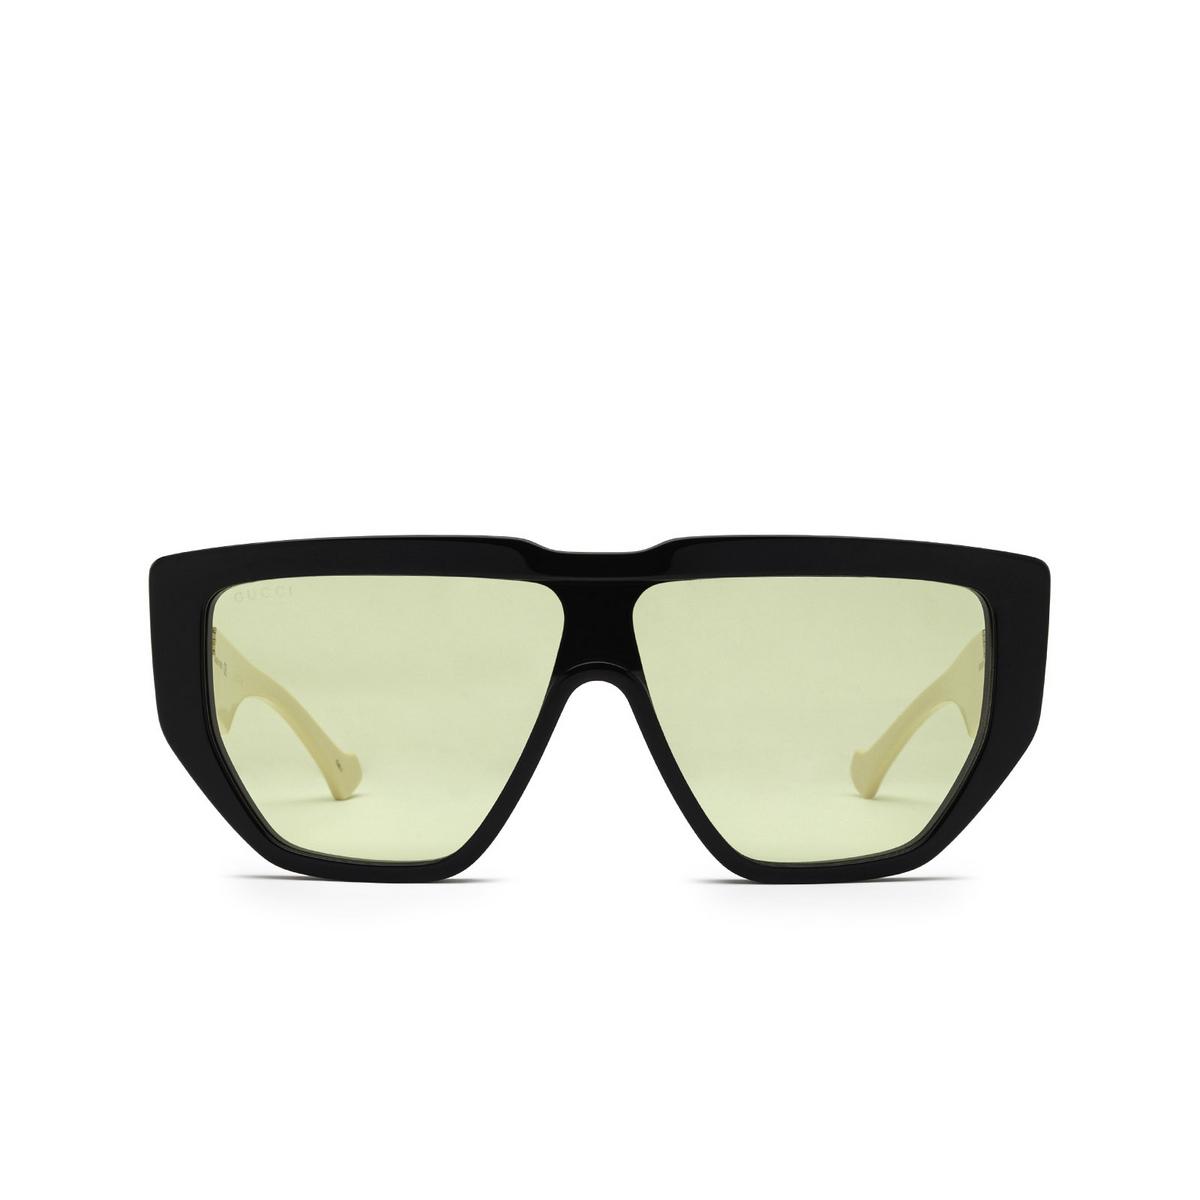 Gucci® Mask Sunglasses: GG0997S color Black 001 - front view.